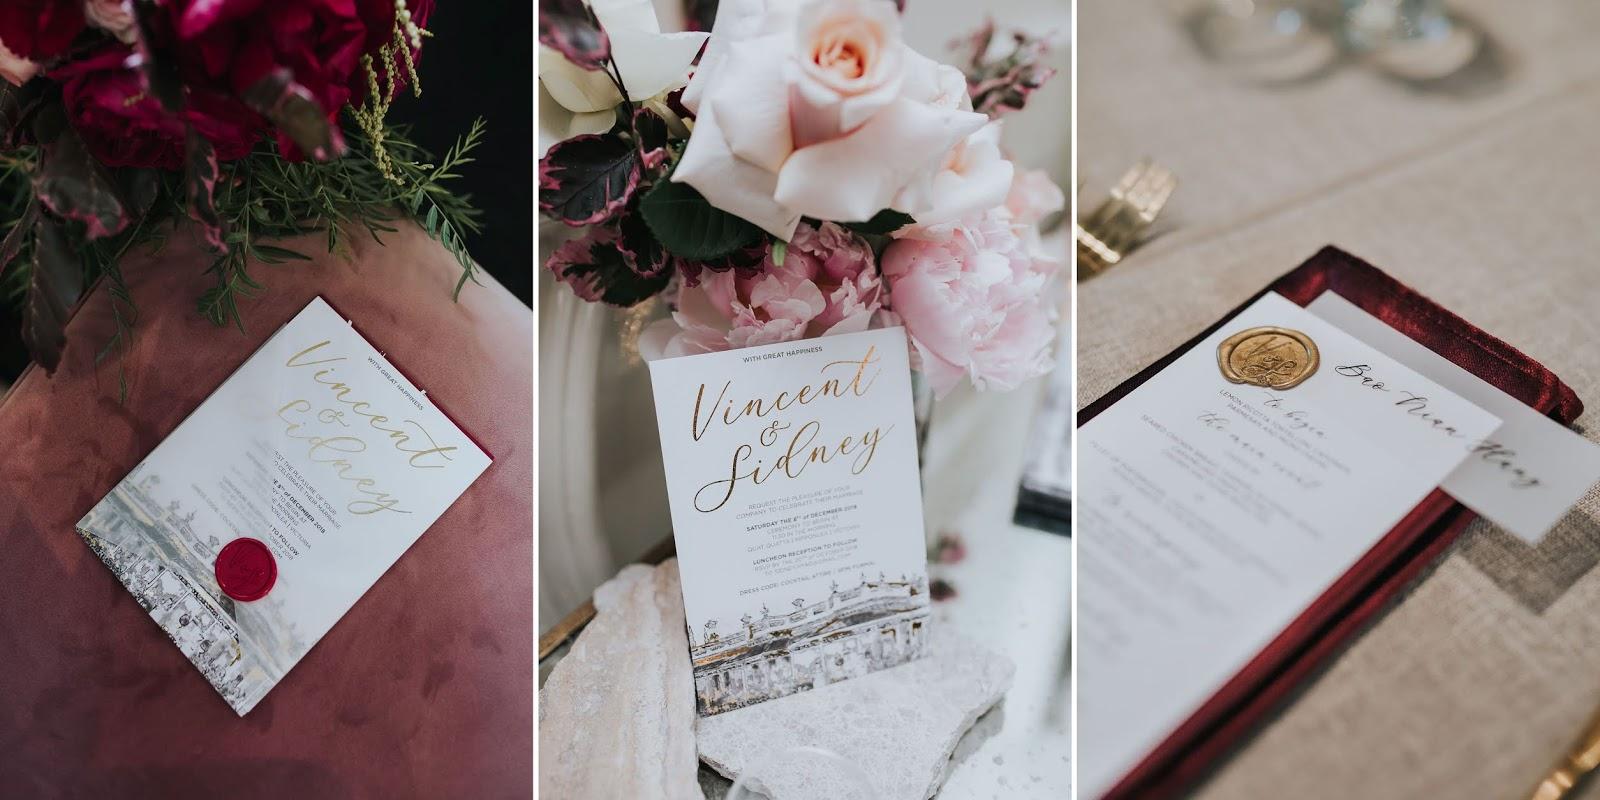 Designing Our Wedding Invitation